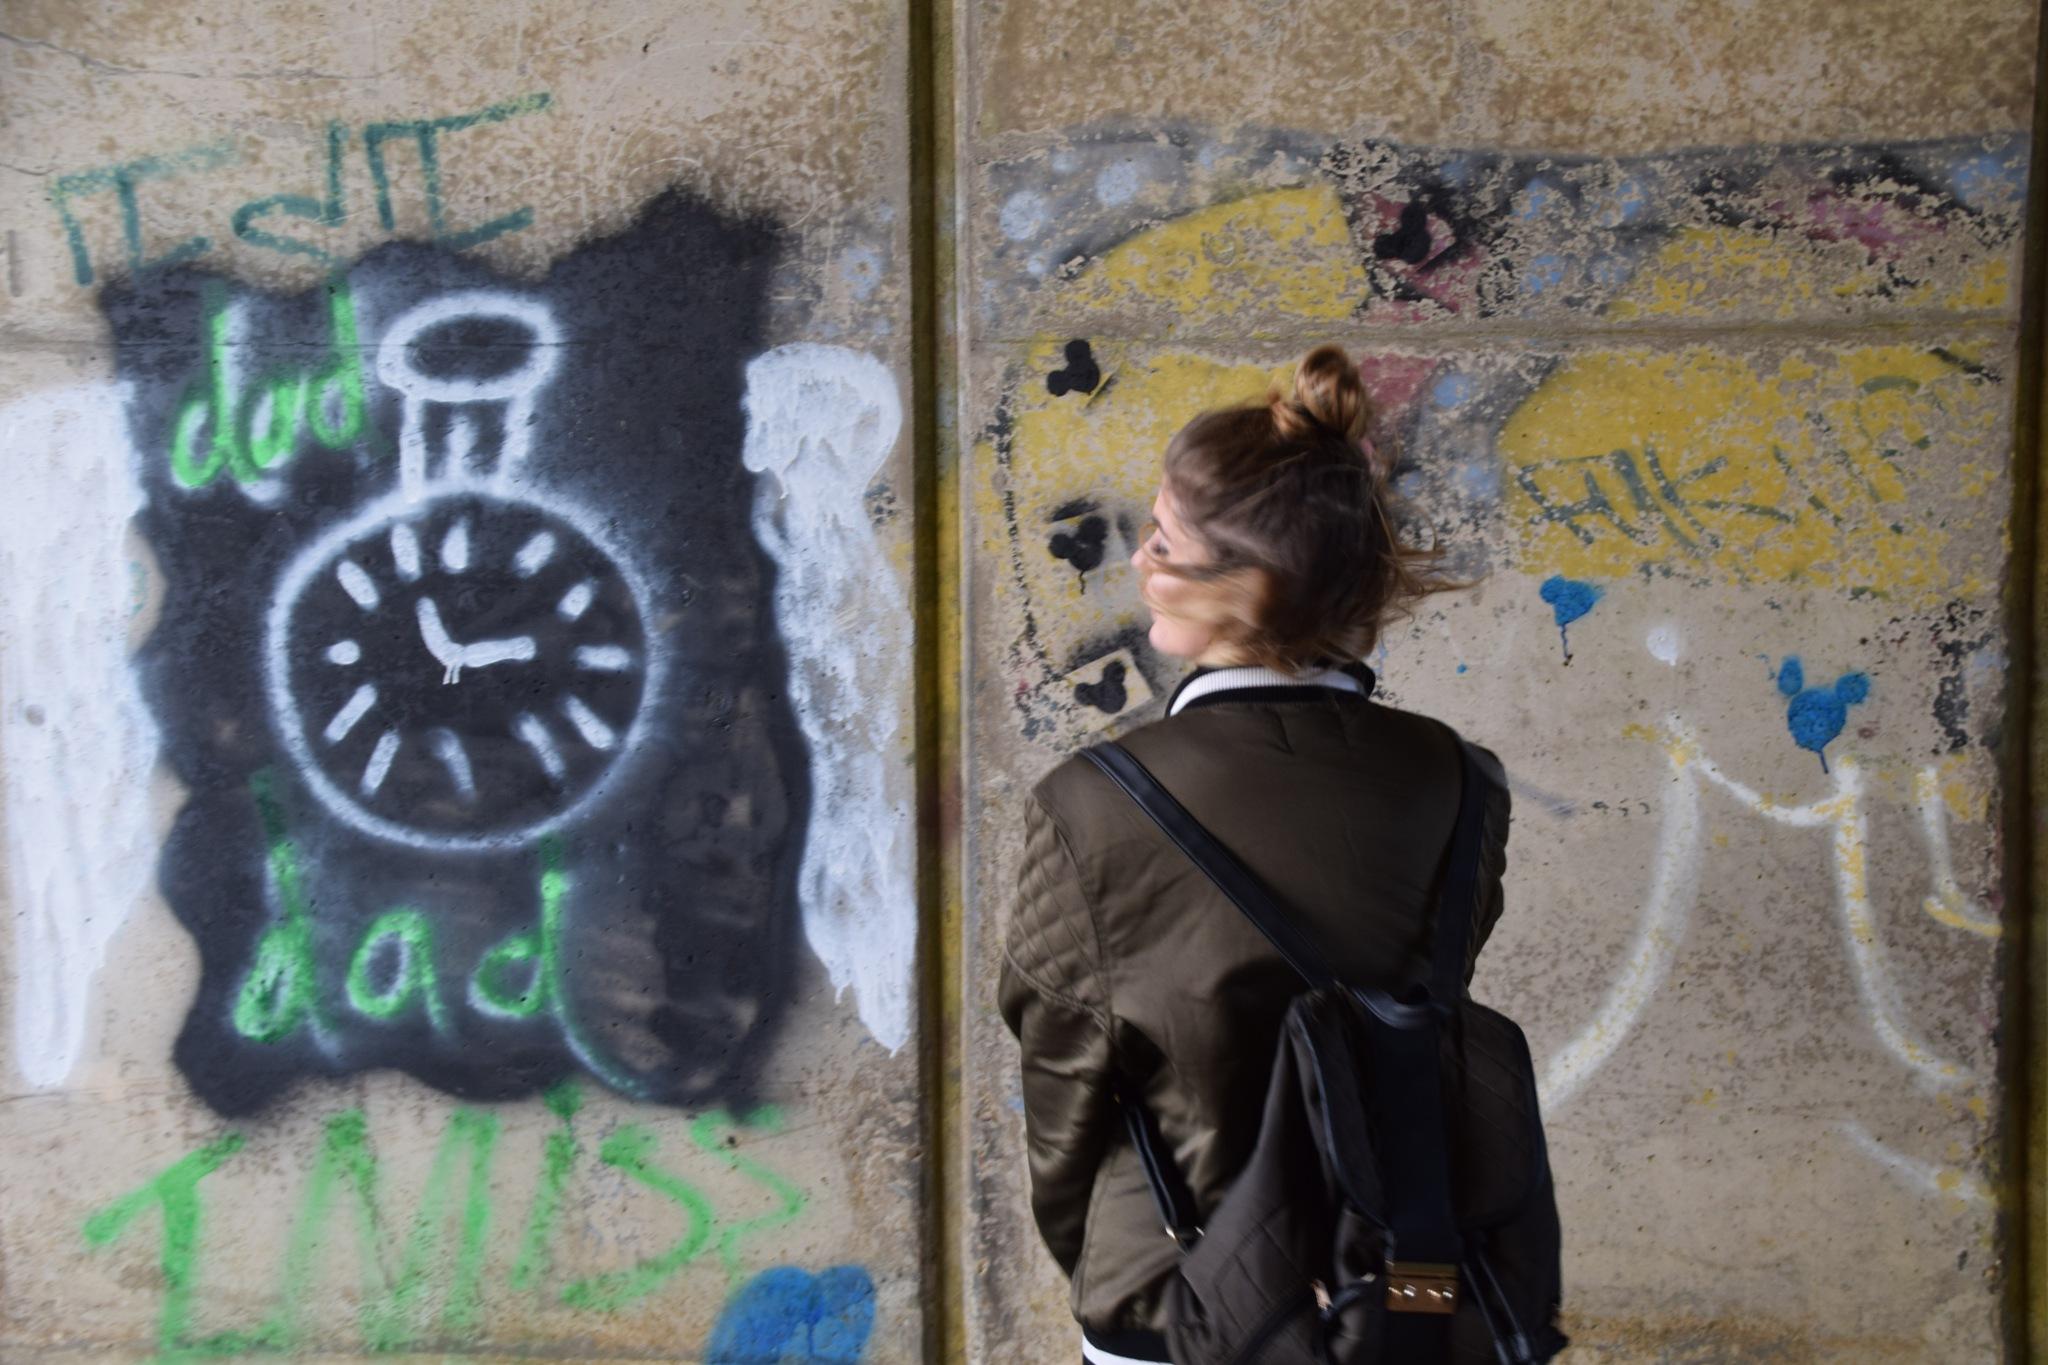 Where Did the Time Go? by Kian Owen Bartlett